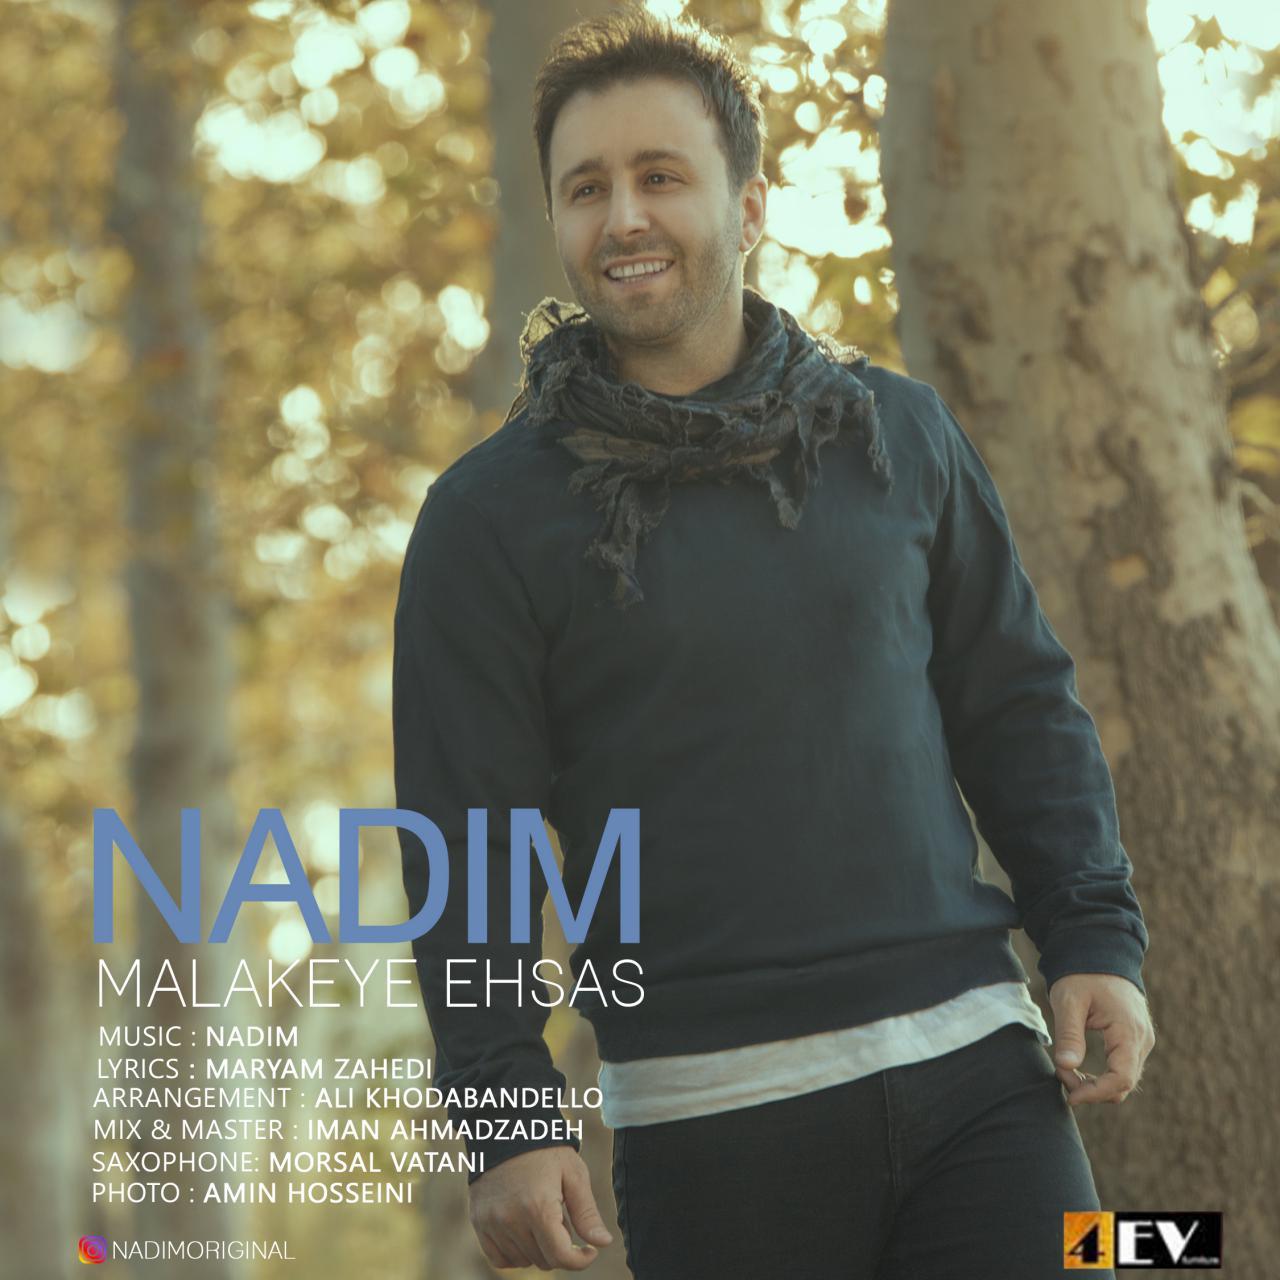 Nadim – Malakeye Ehsas